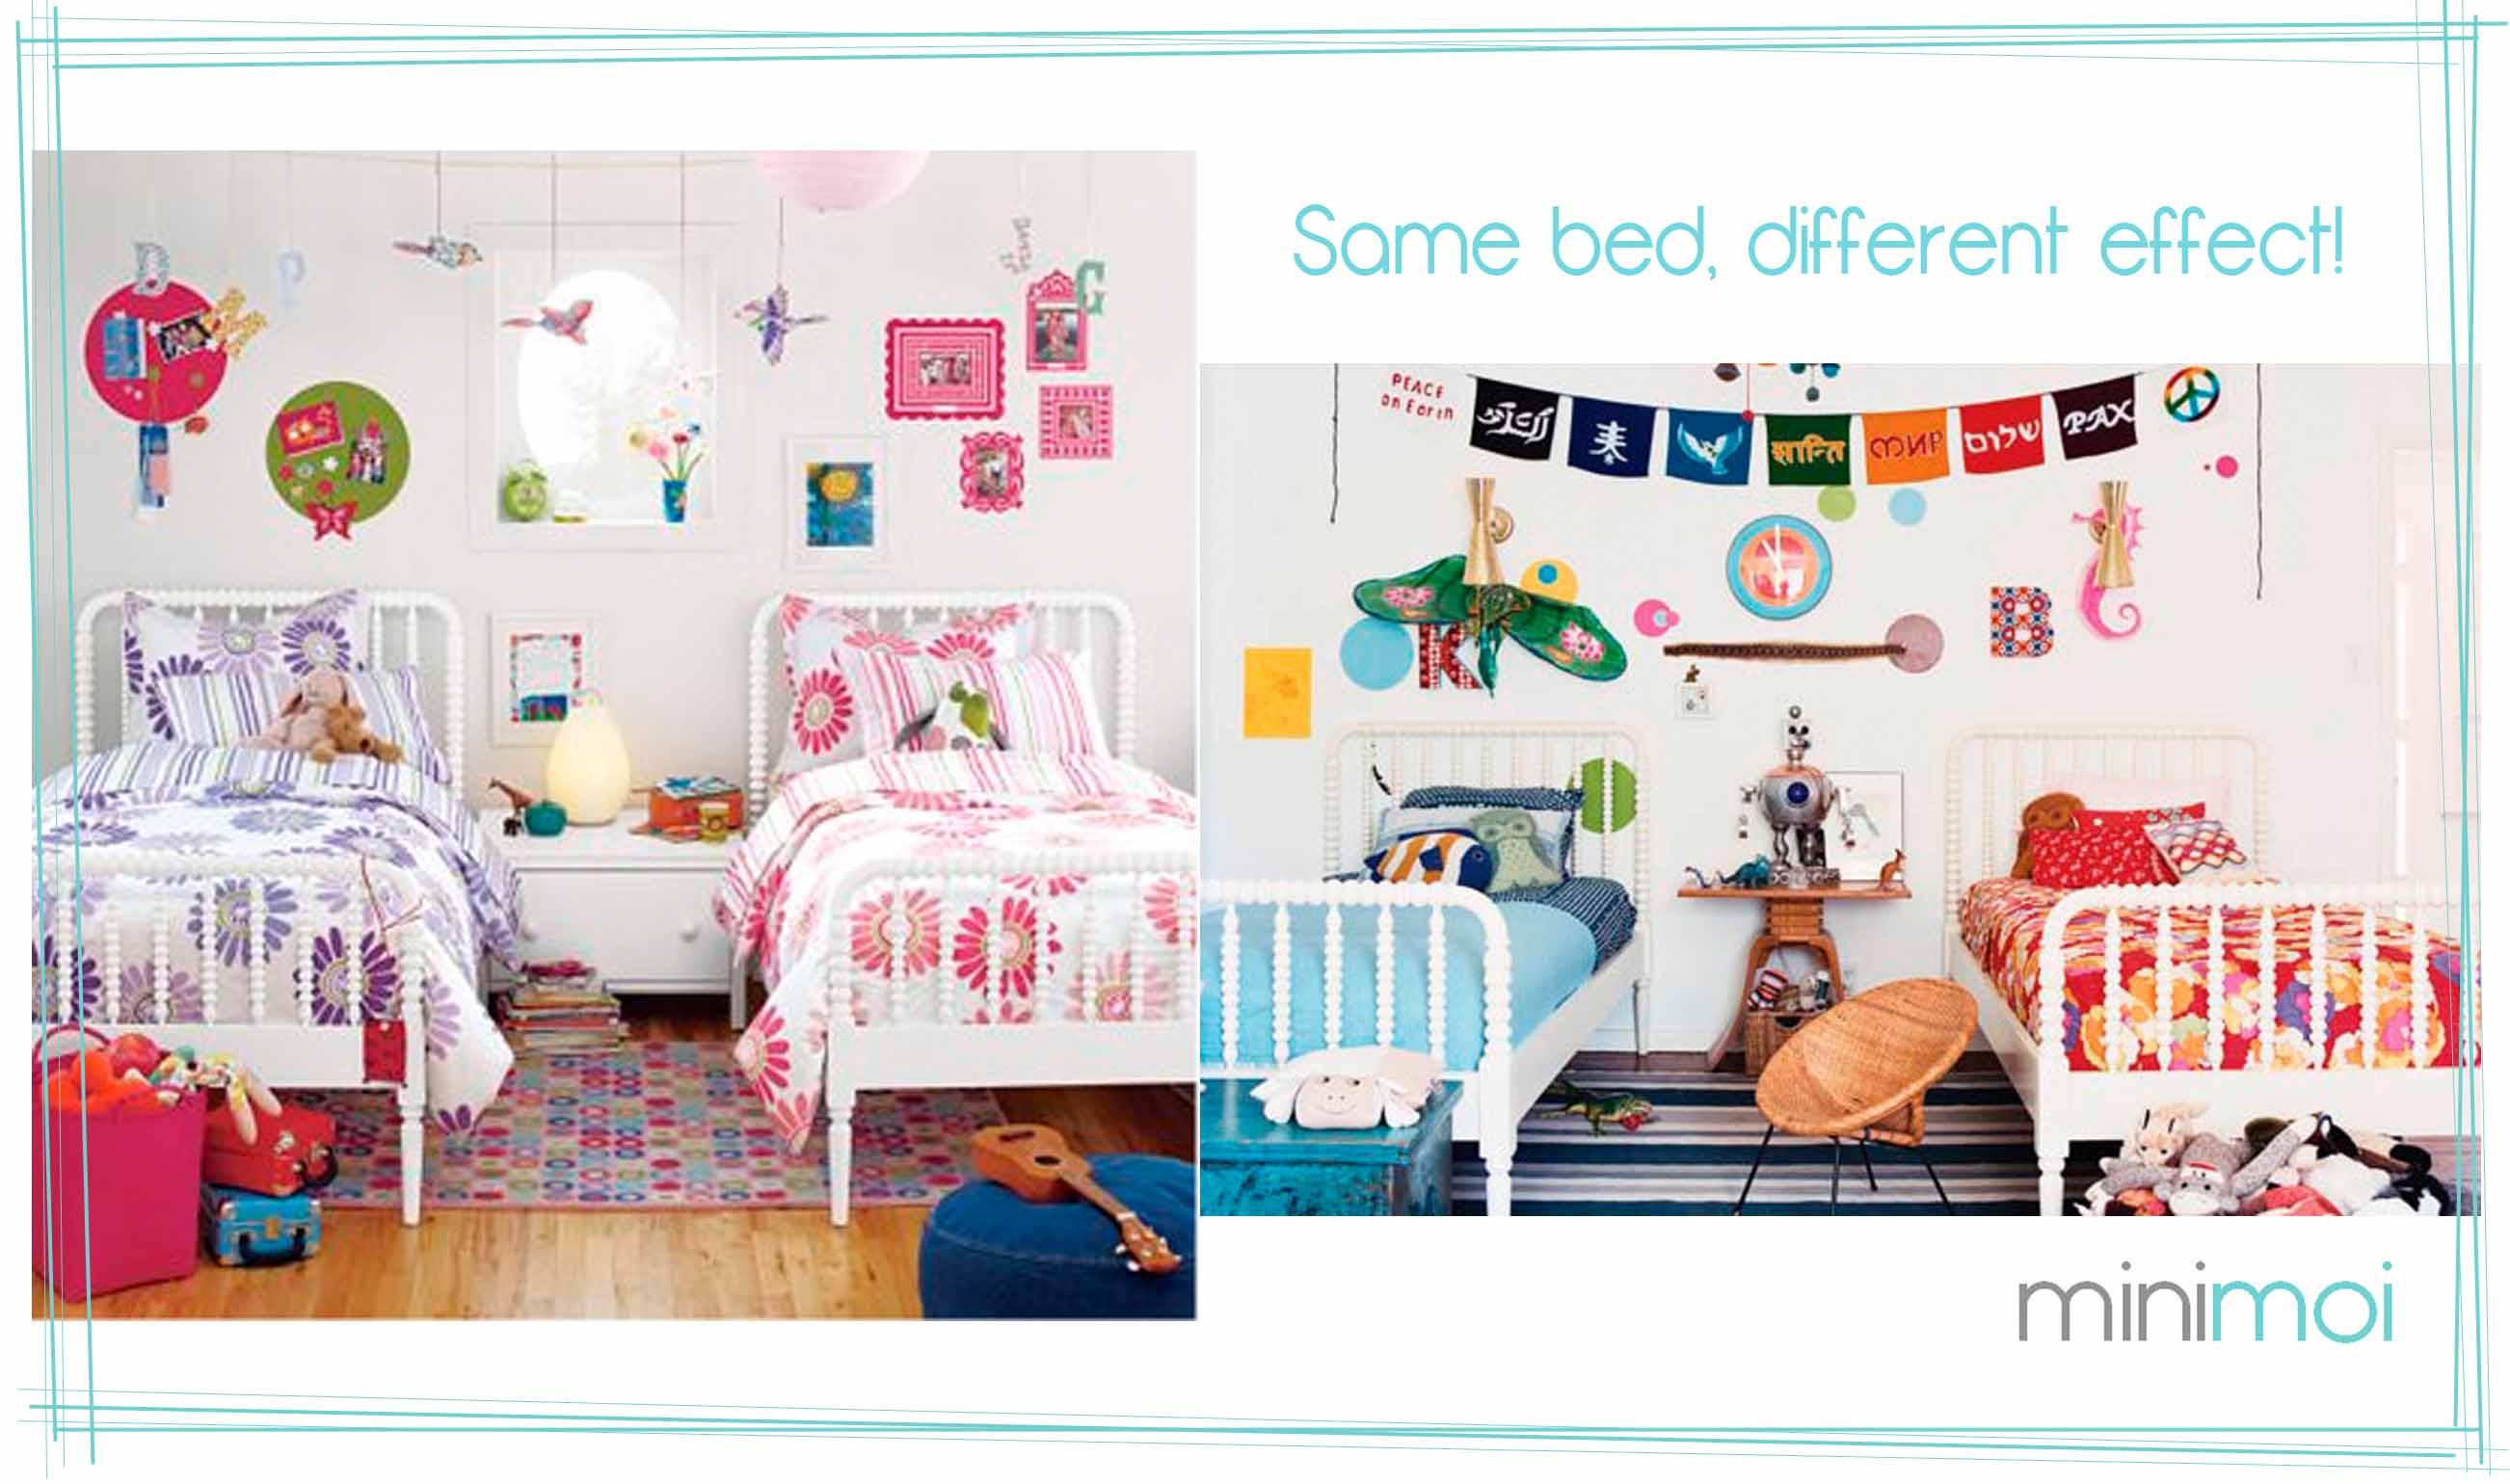 Shared-bedrooms-girl-boy